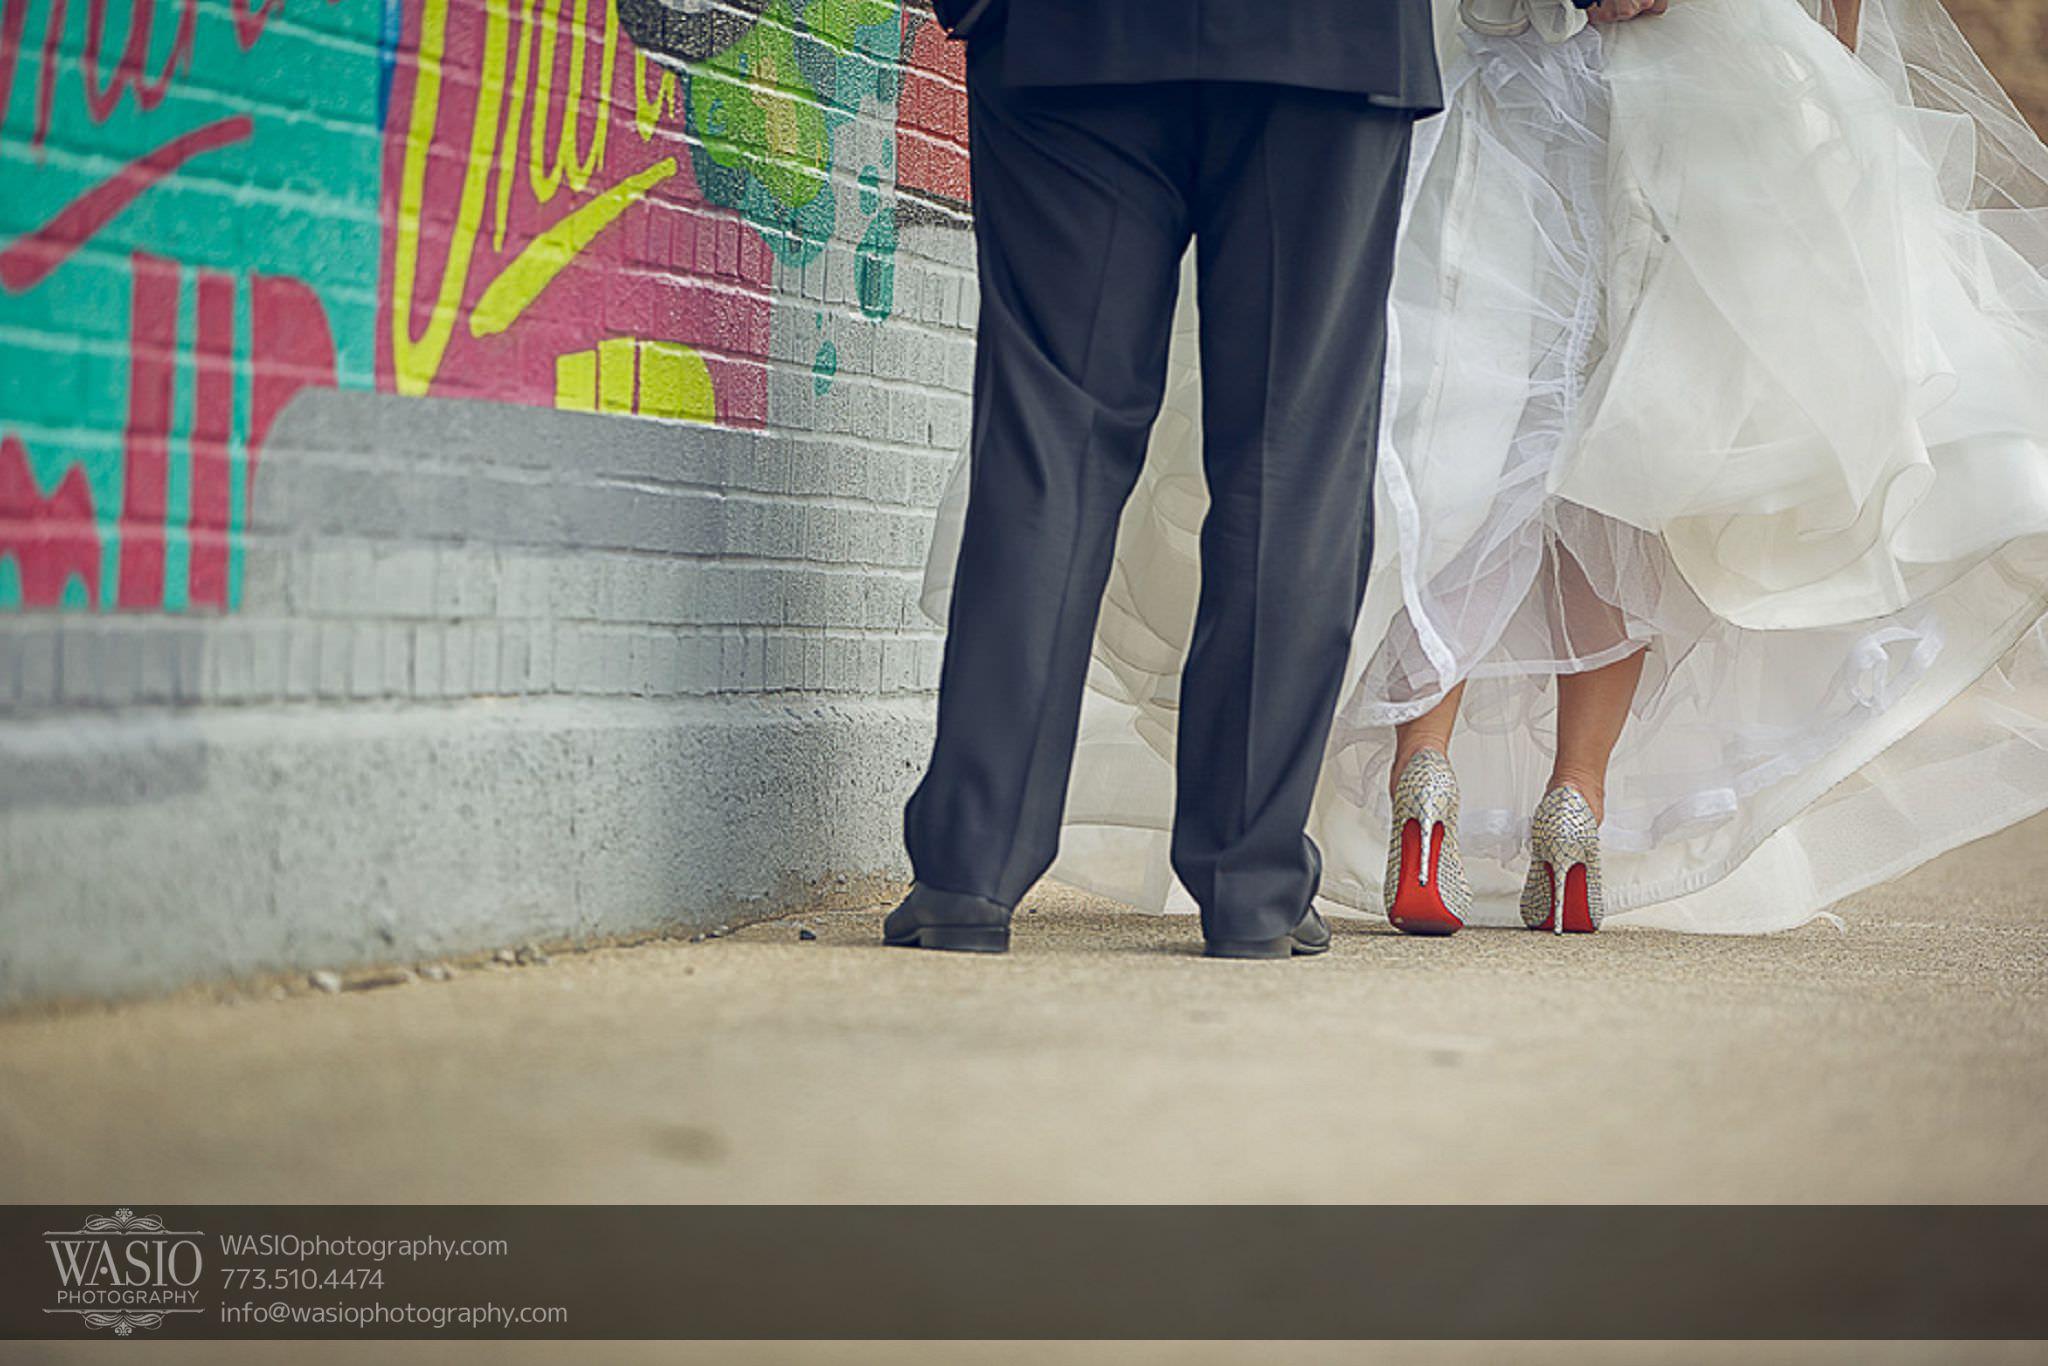 venue-one-chicago-wedding-red-bottoms-louboutin-66 Venue One Chicago Wedding - Katie + Mike